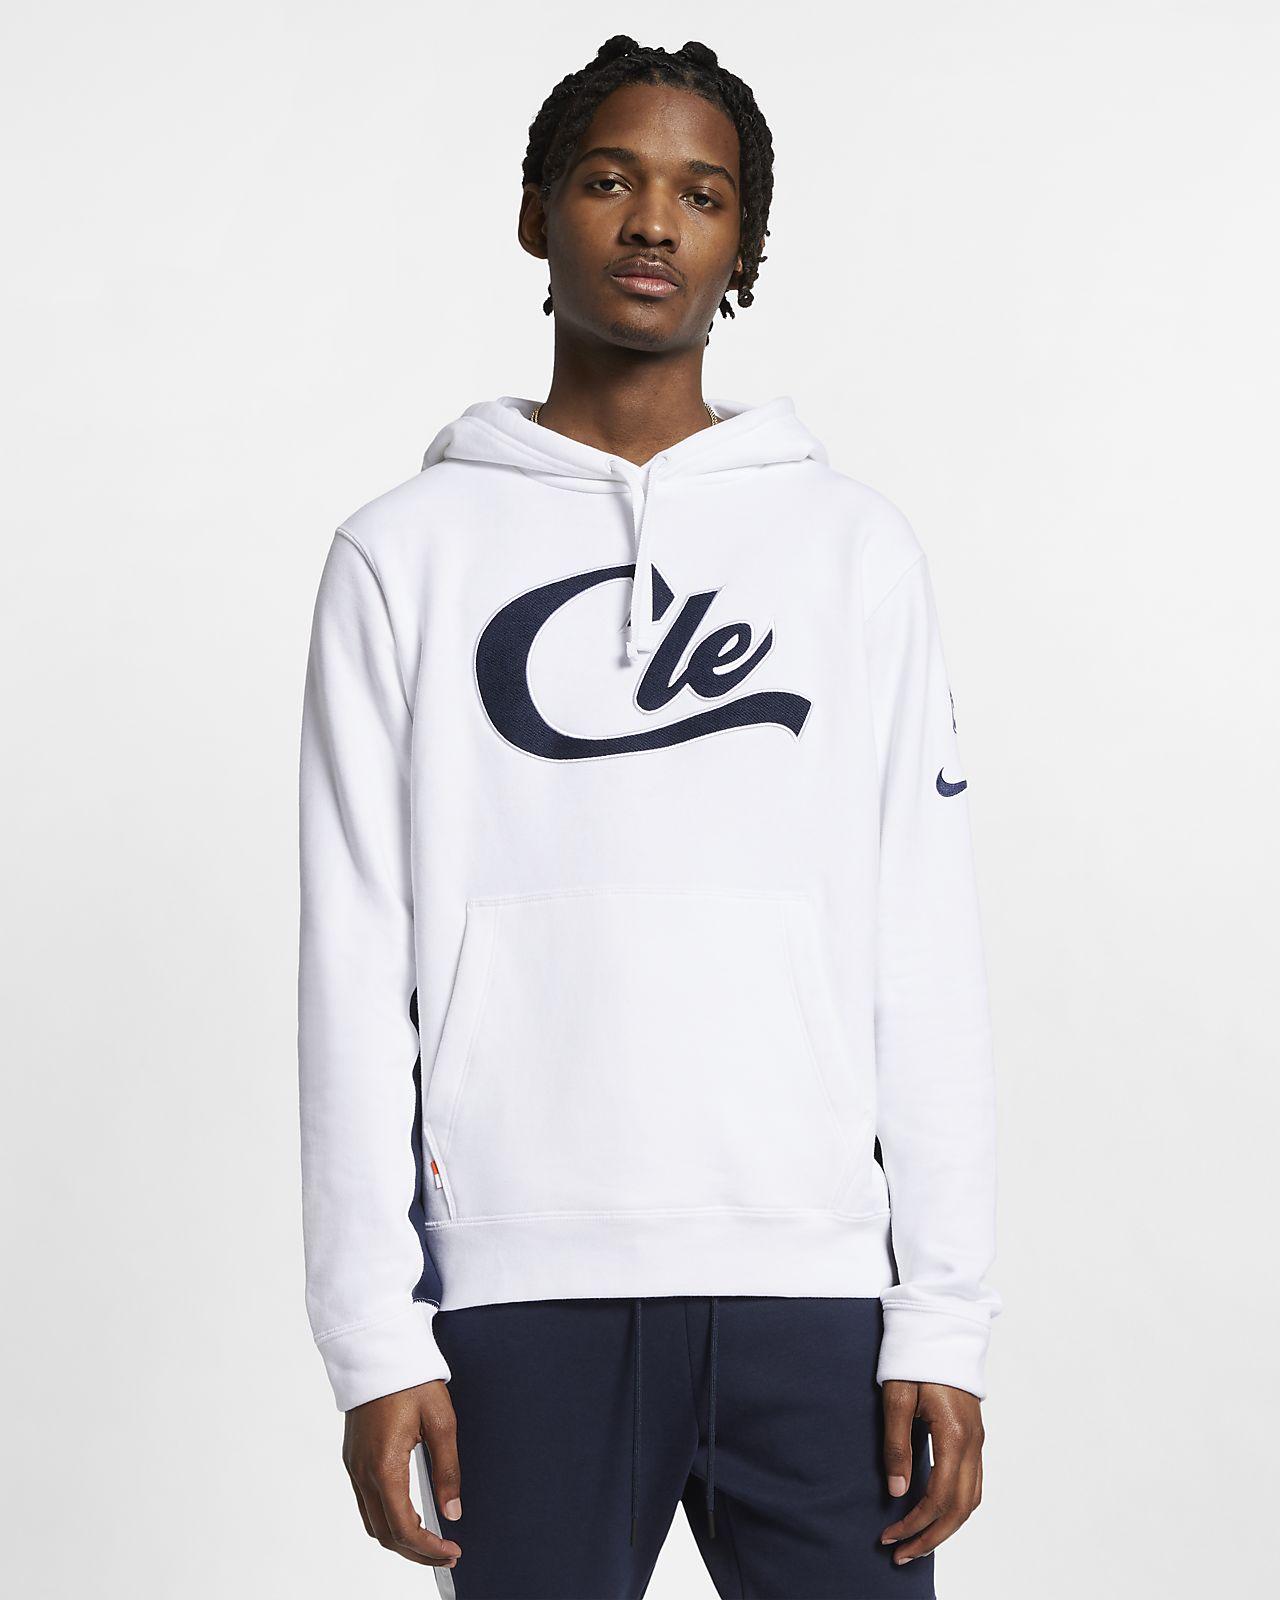 Cleveland Cavaliers Nike NBA-hoodie voor heren